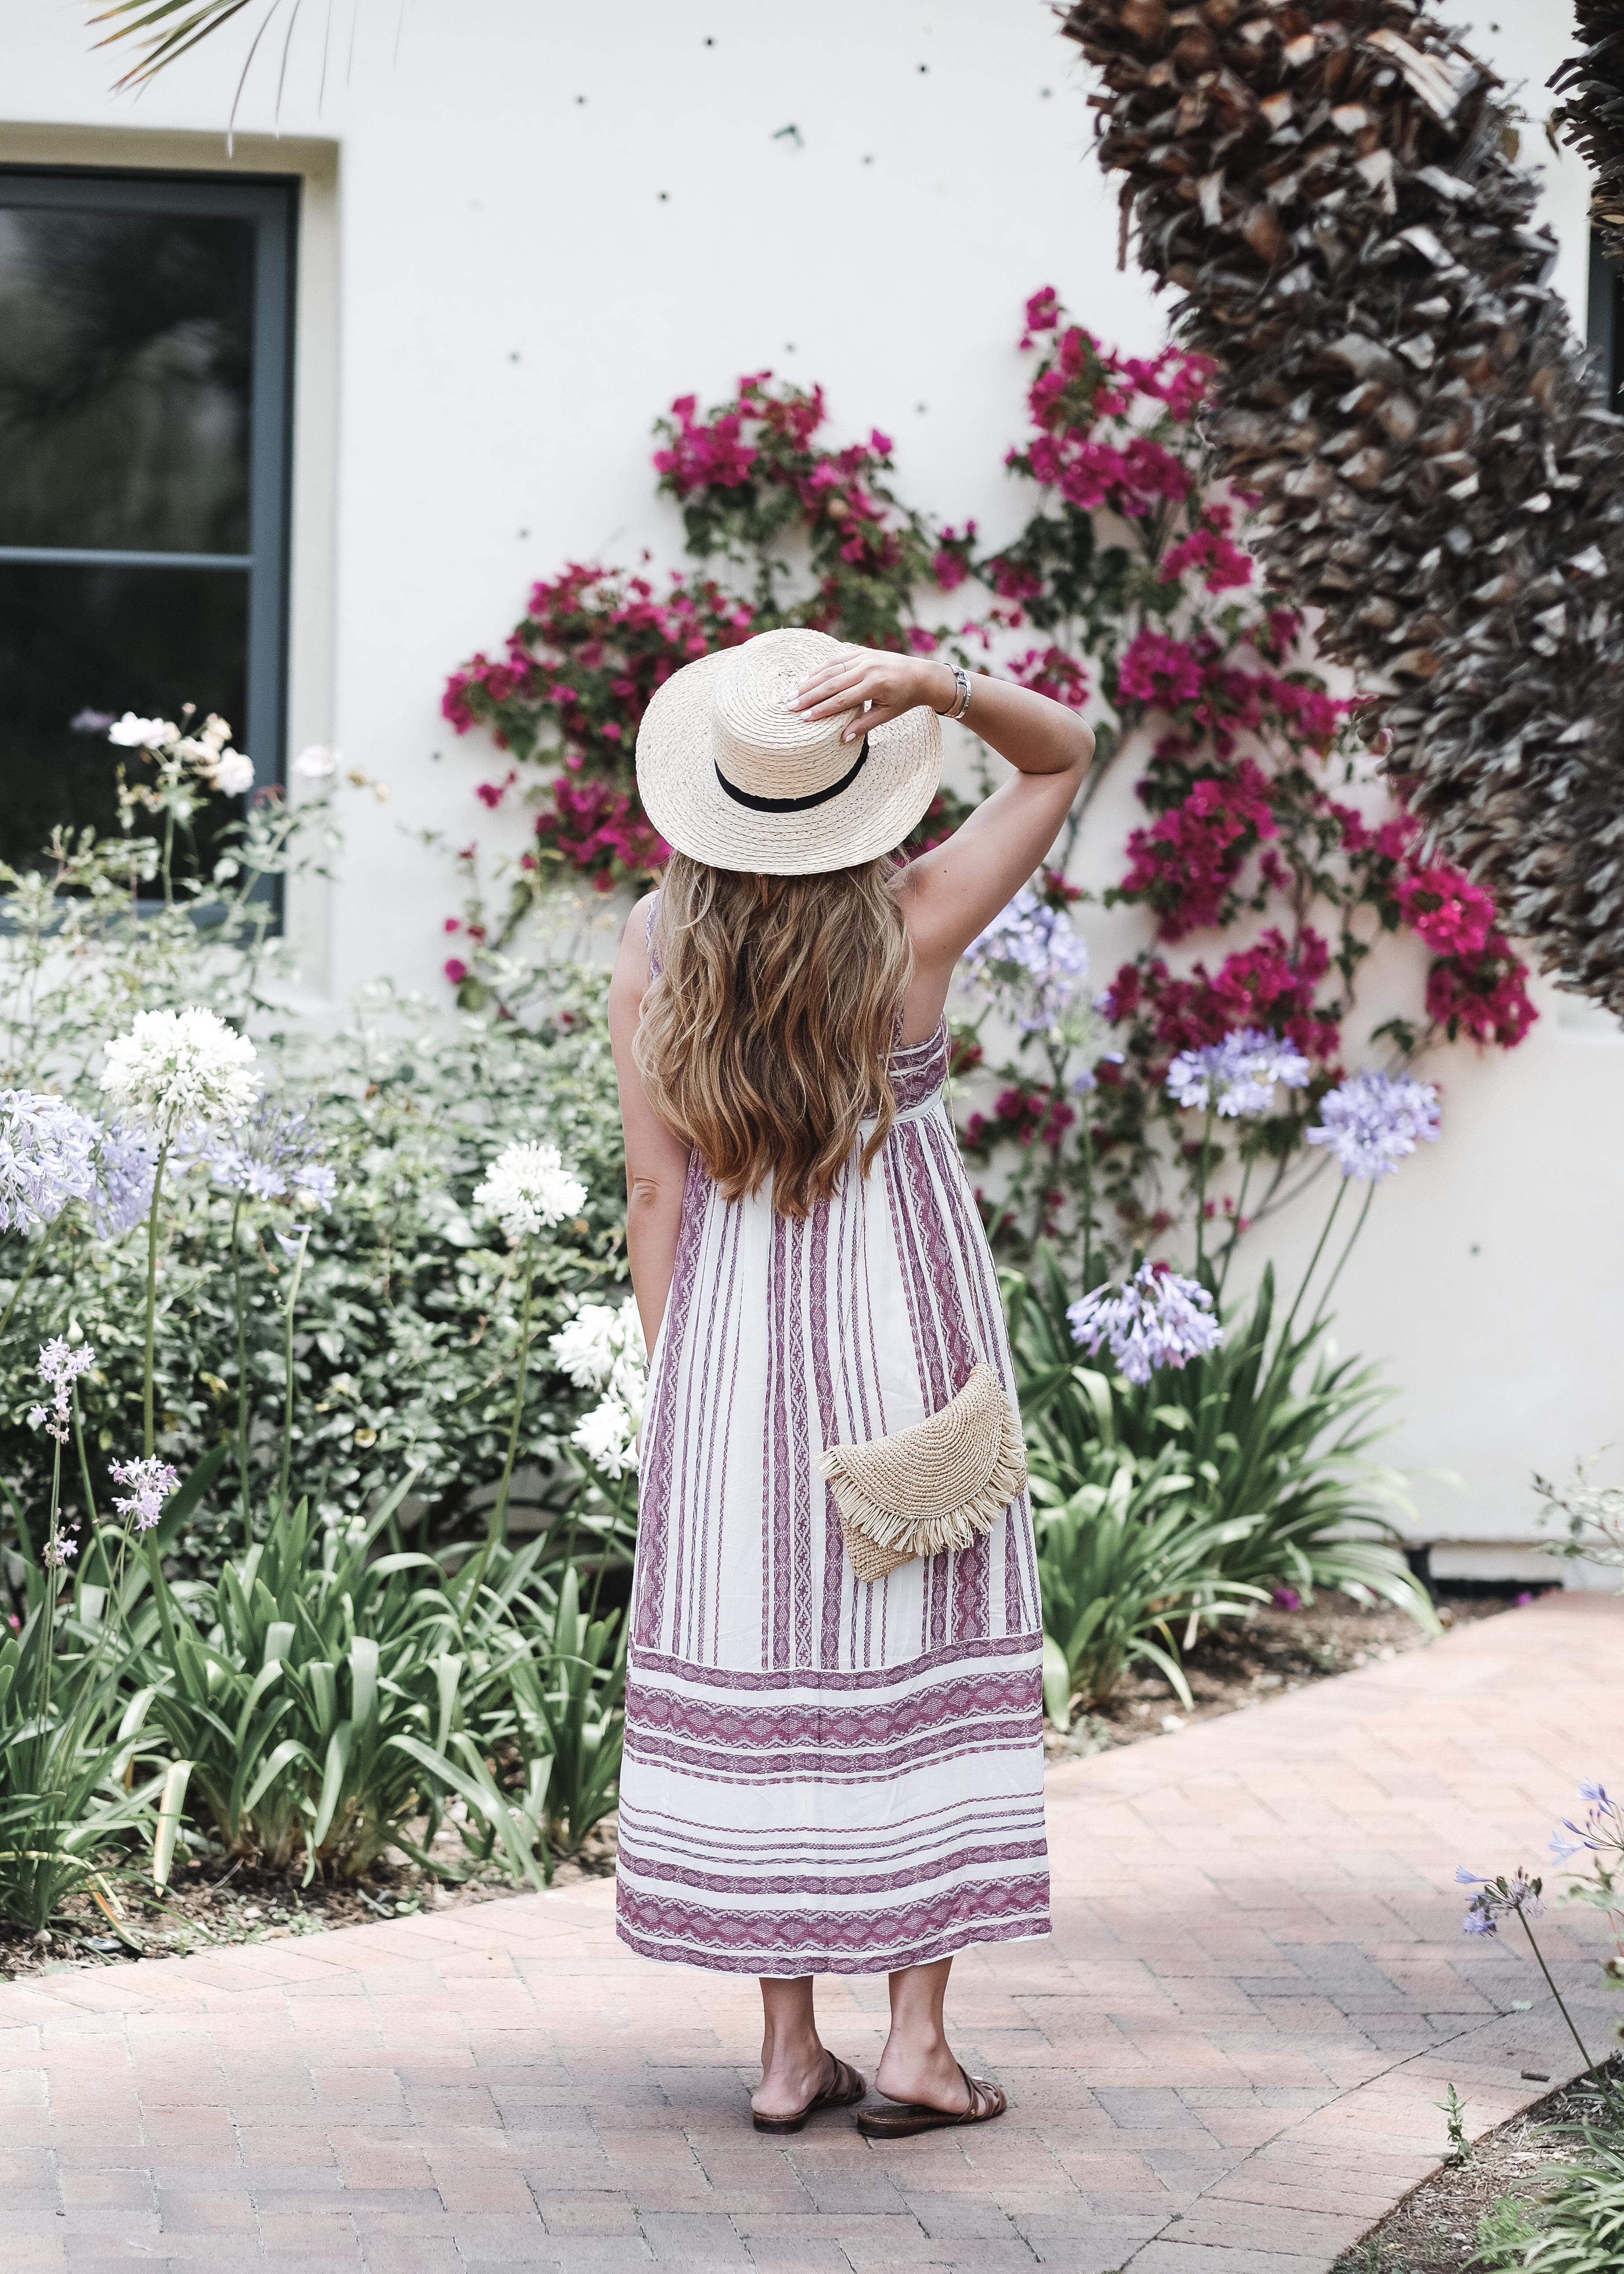 Summer Essentials: A Striped Midi Dress   Straw Hat | The Teacher Diva: a Dallas Fashion Blog featuring Beauty & Lifestyle